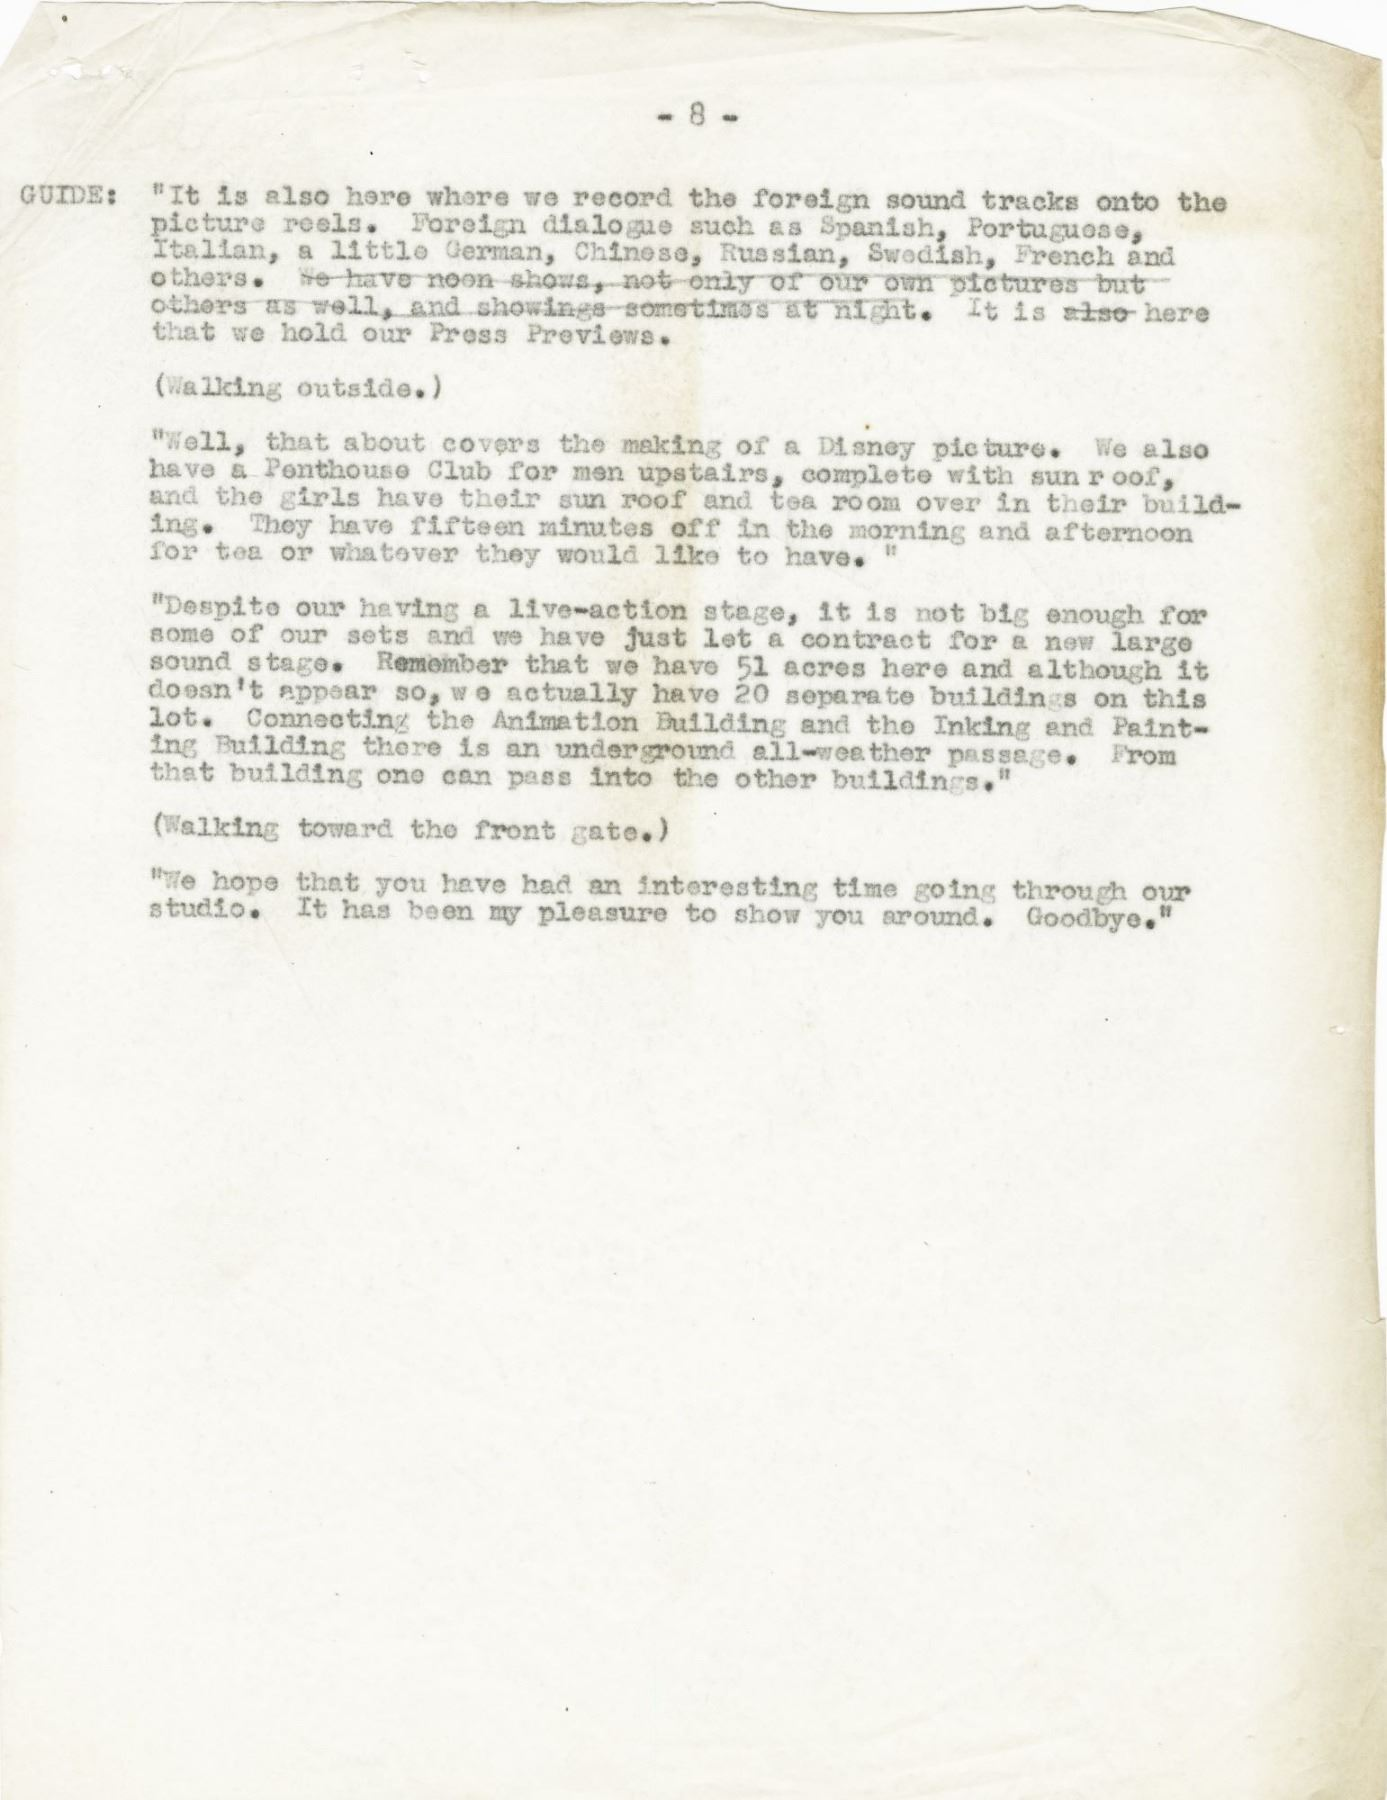 Page from Walt Disney Studios Tour Guide Script